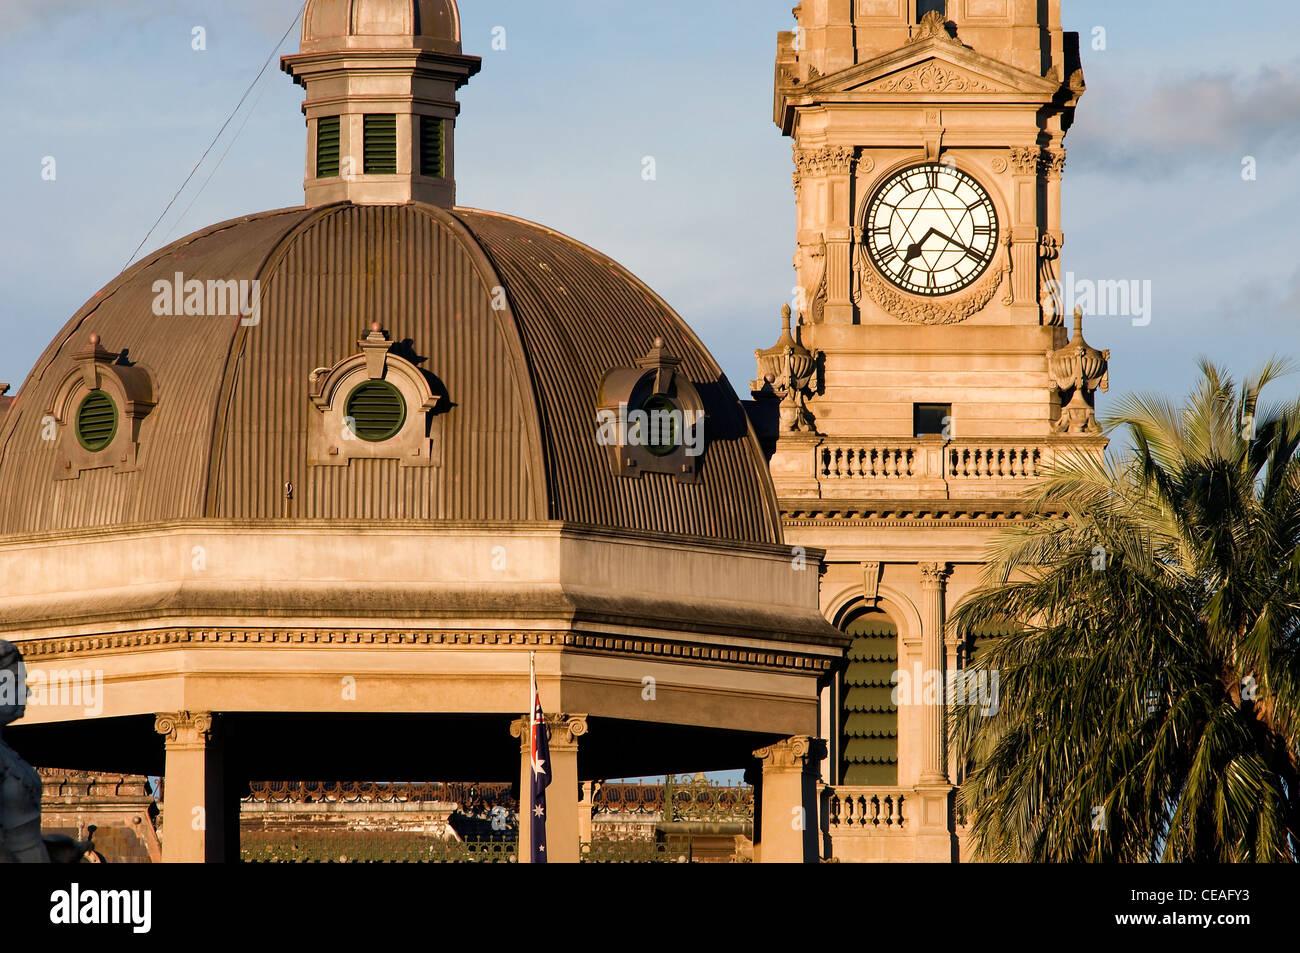 Bendigo RSL Memorial Hall & Military Museum and Post Office. - Stock Image